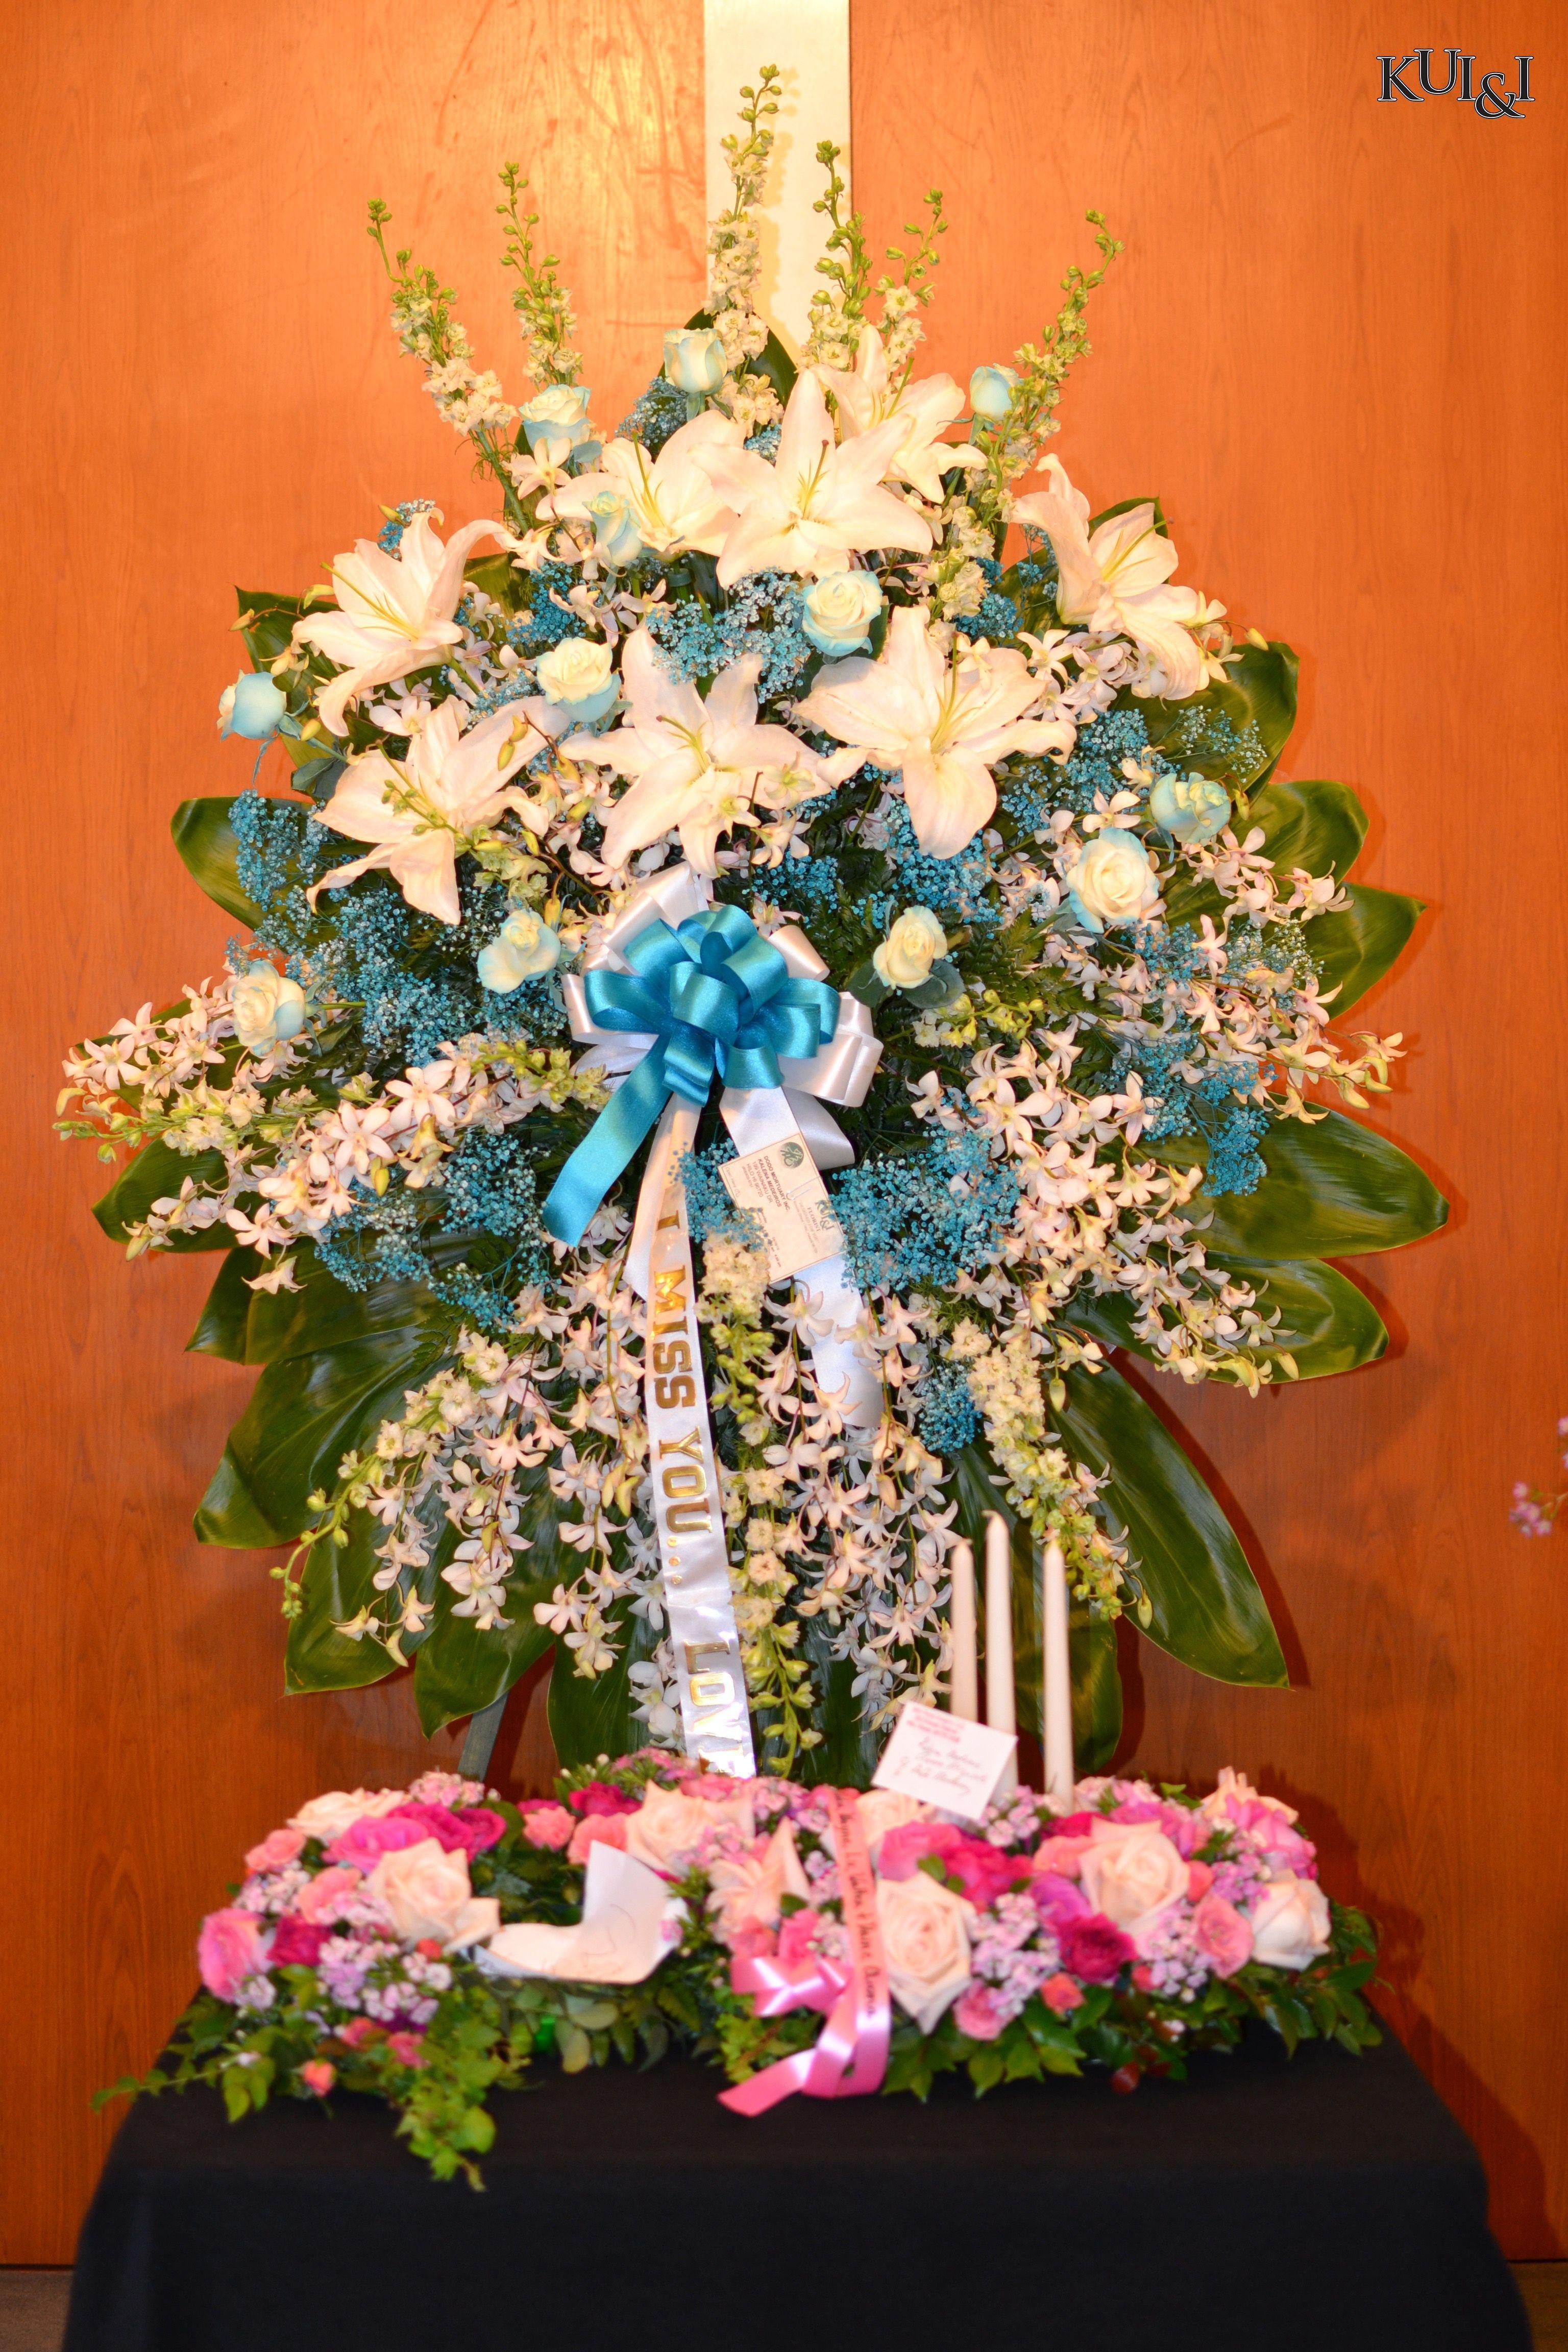 Tiffany Blue Funeral Standing Spray Kui I Florist Llc Hilo